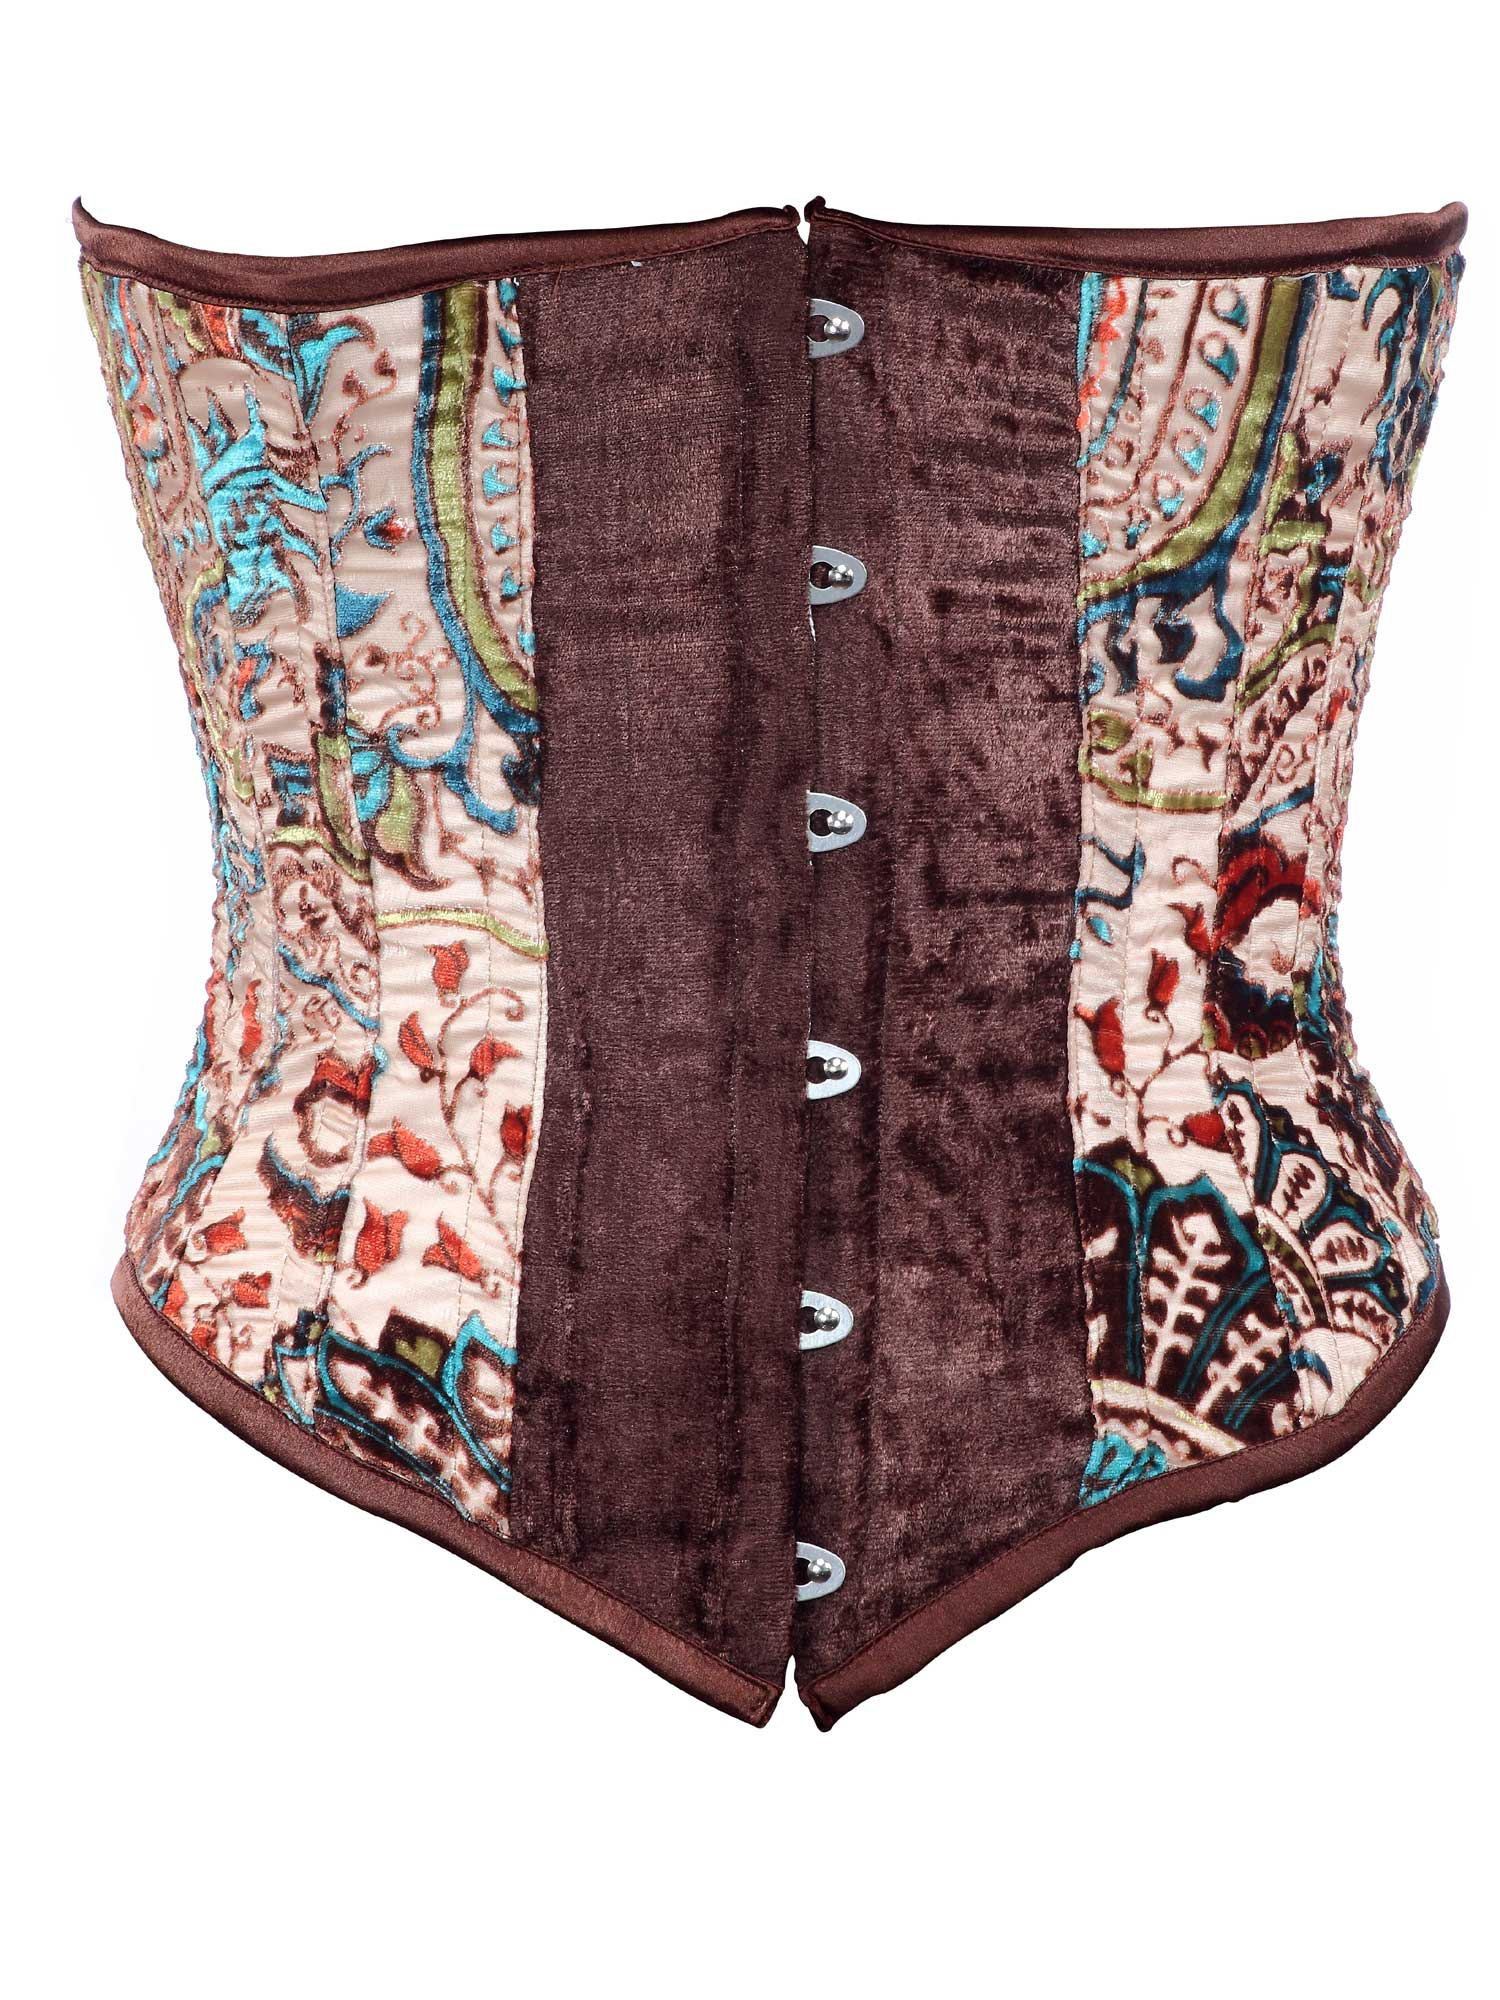 floral_velvet_fabric_steel_boning_underbust_corset_waist_cincher_bustier_bustiers_and_corsets_5.jpg